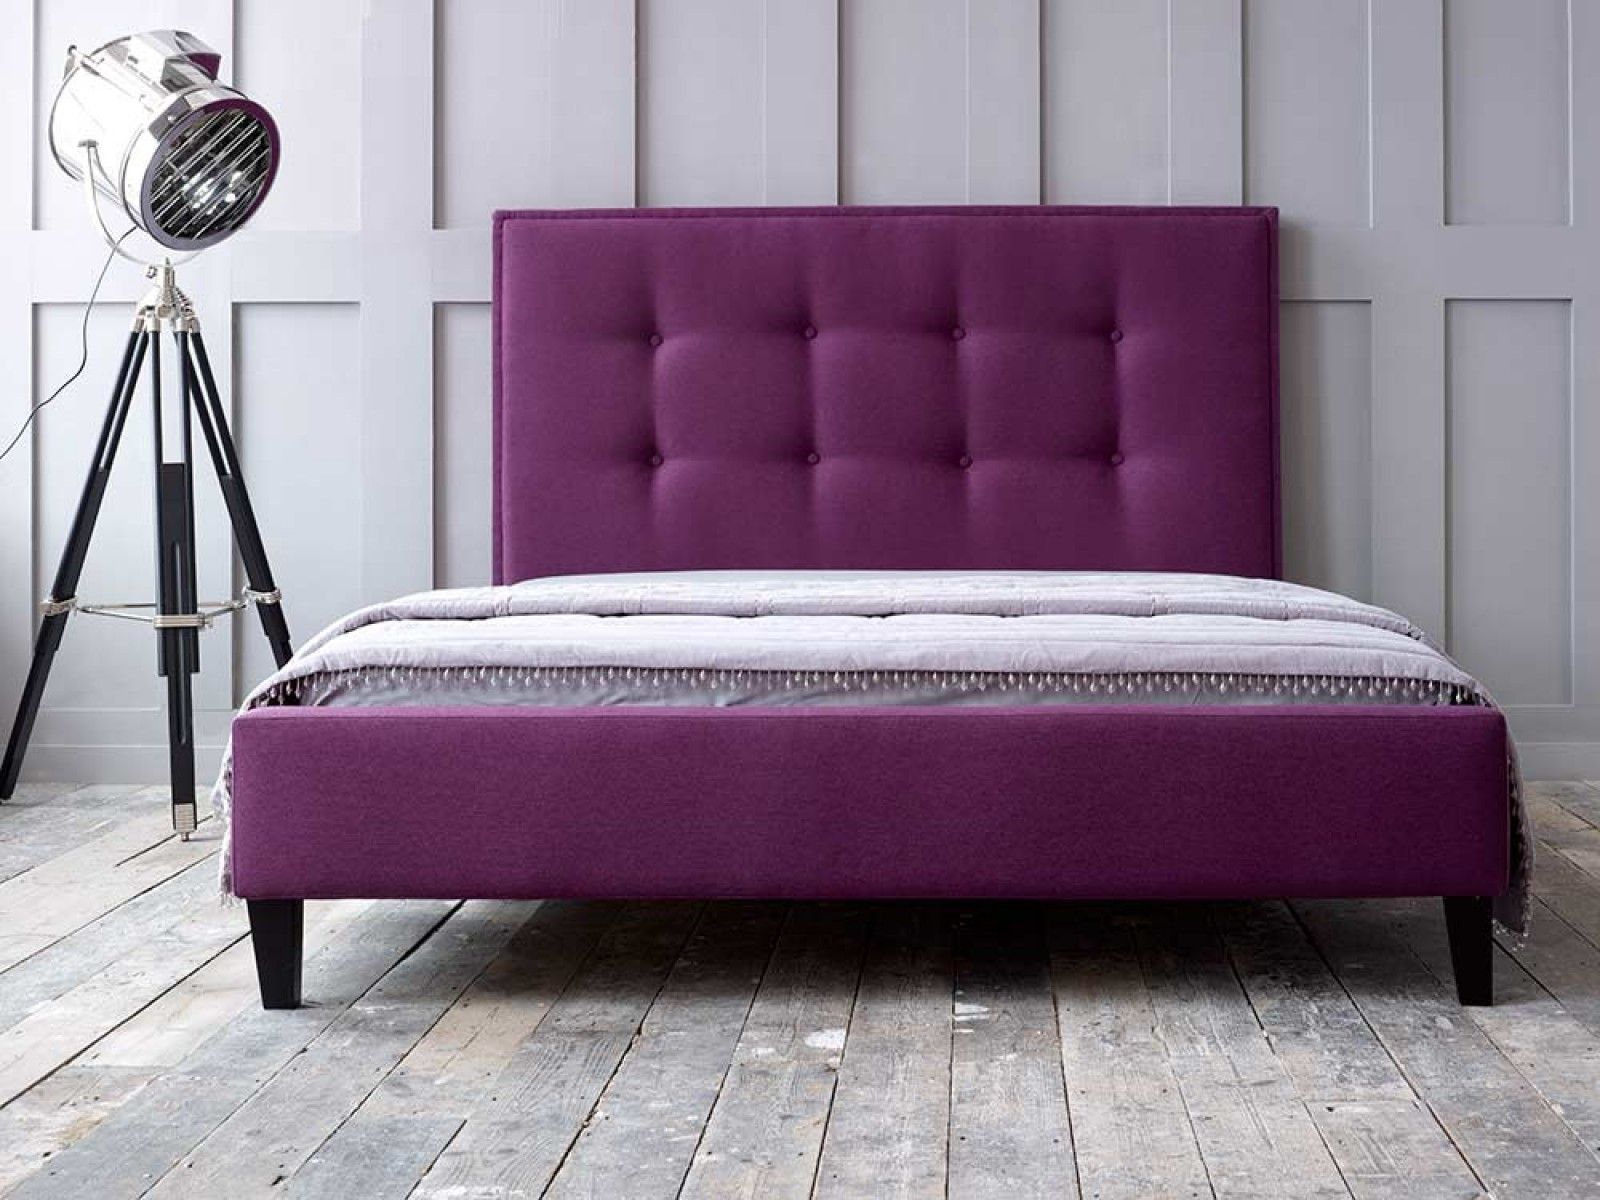 Ivy Short Bed Living It Up Blue bedroom, Buttoned